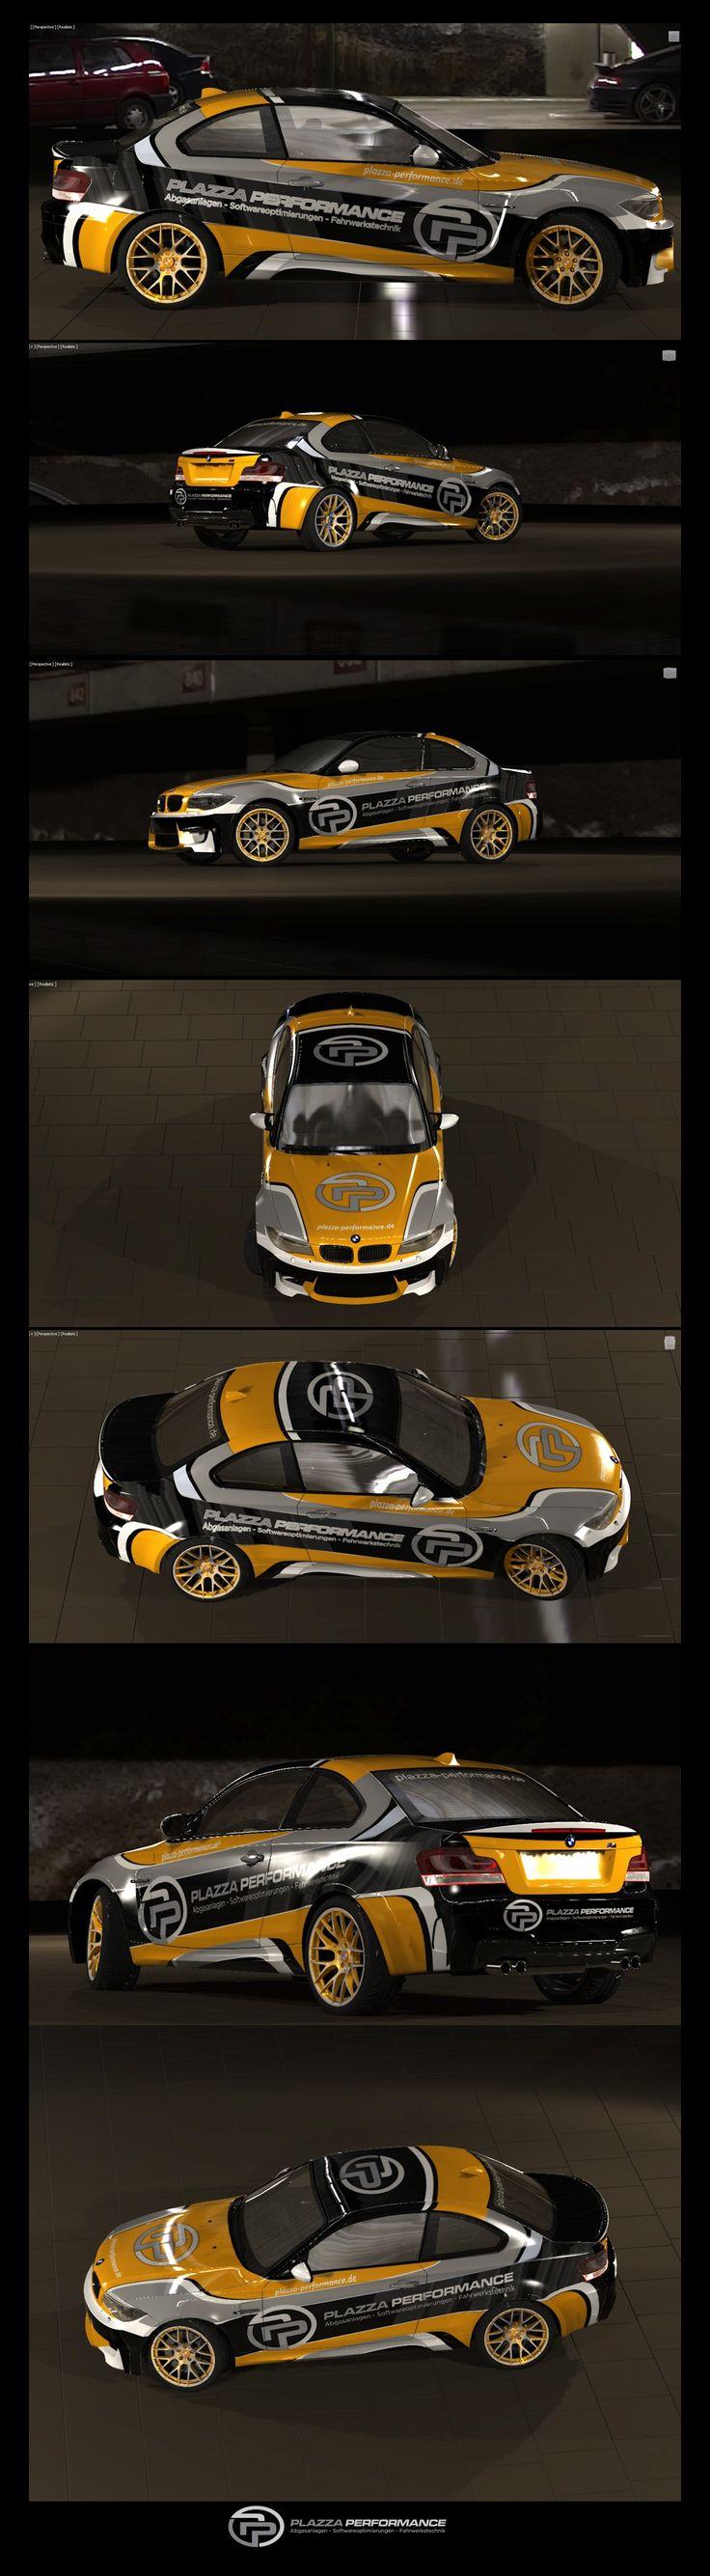 Car stickers design images - Ontwerp 81 Door Levmans Erstellt Ein Cooles Design F R Plazza Performance Pp135i Car Stickersvehicle